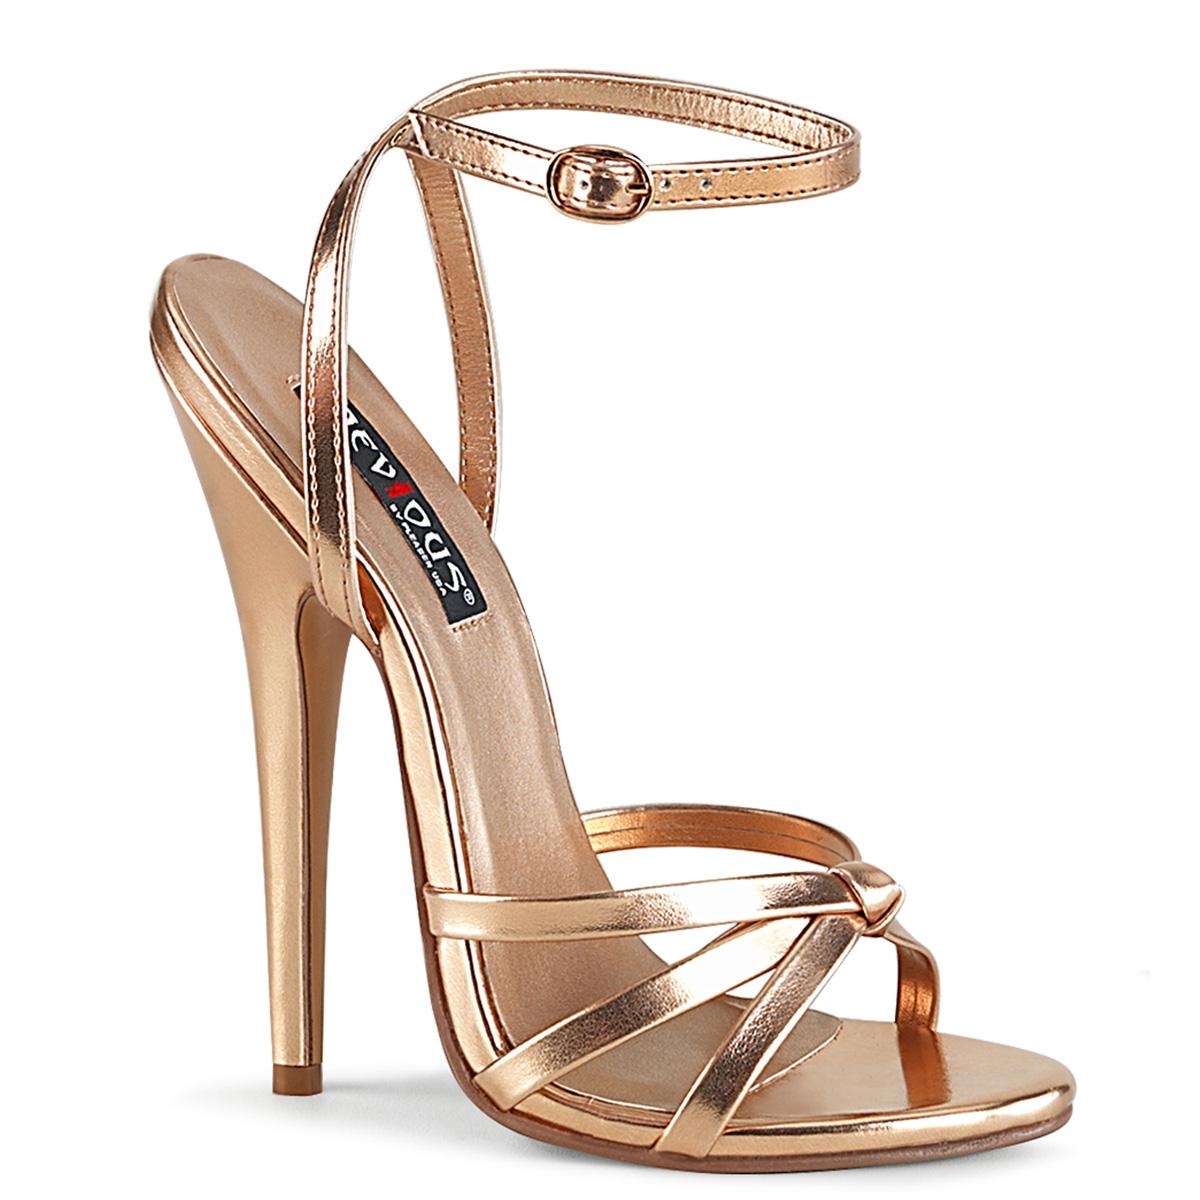 108 Gold Metallic Devious High Heel-Sandales do Mina